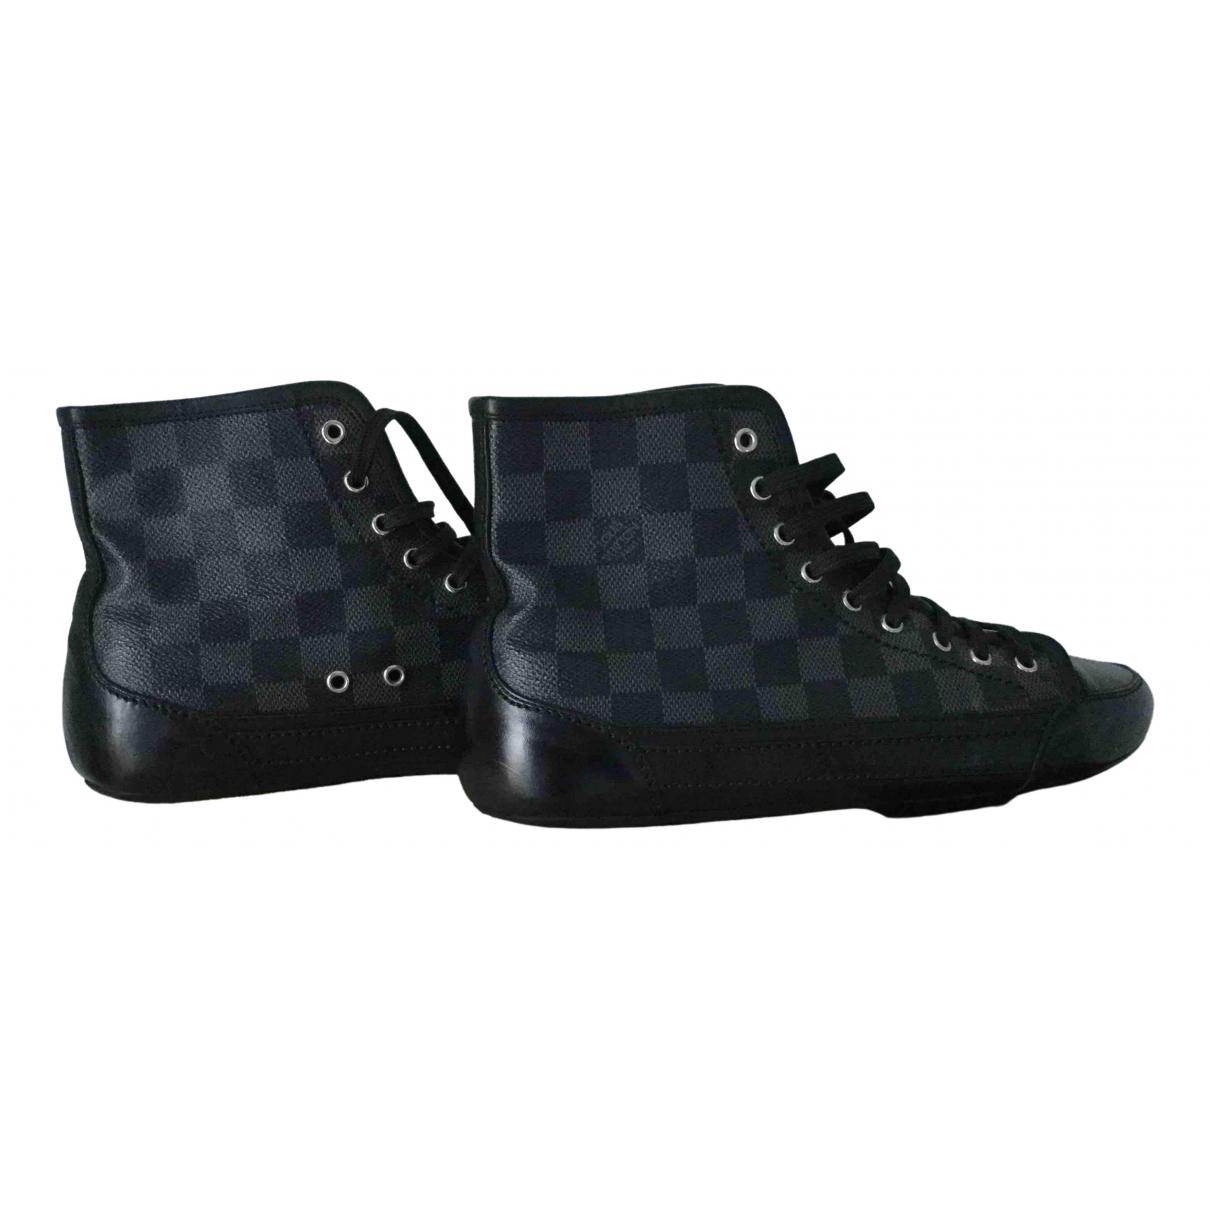 Louis Vuitton \N Black Cloth Trainers for Men 7 UK